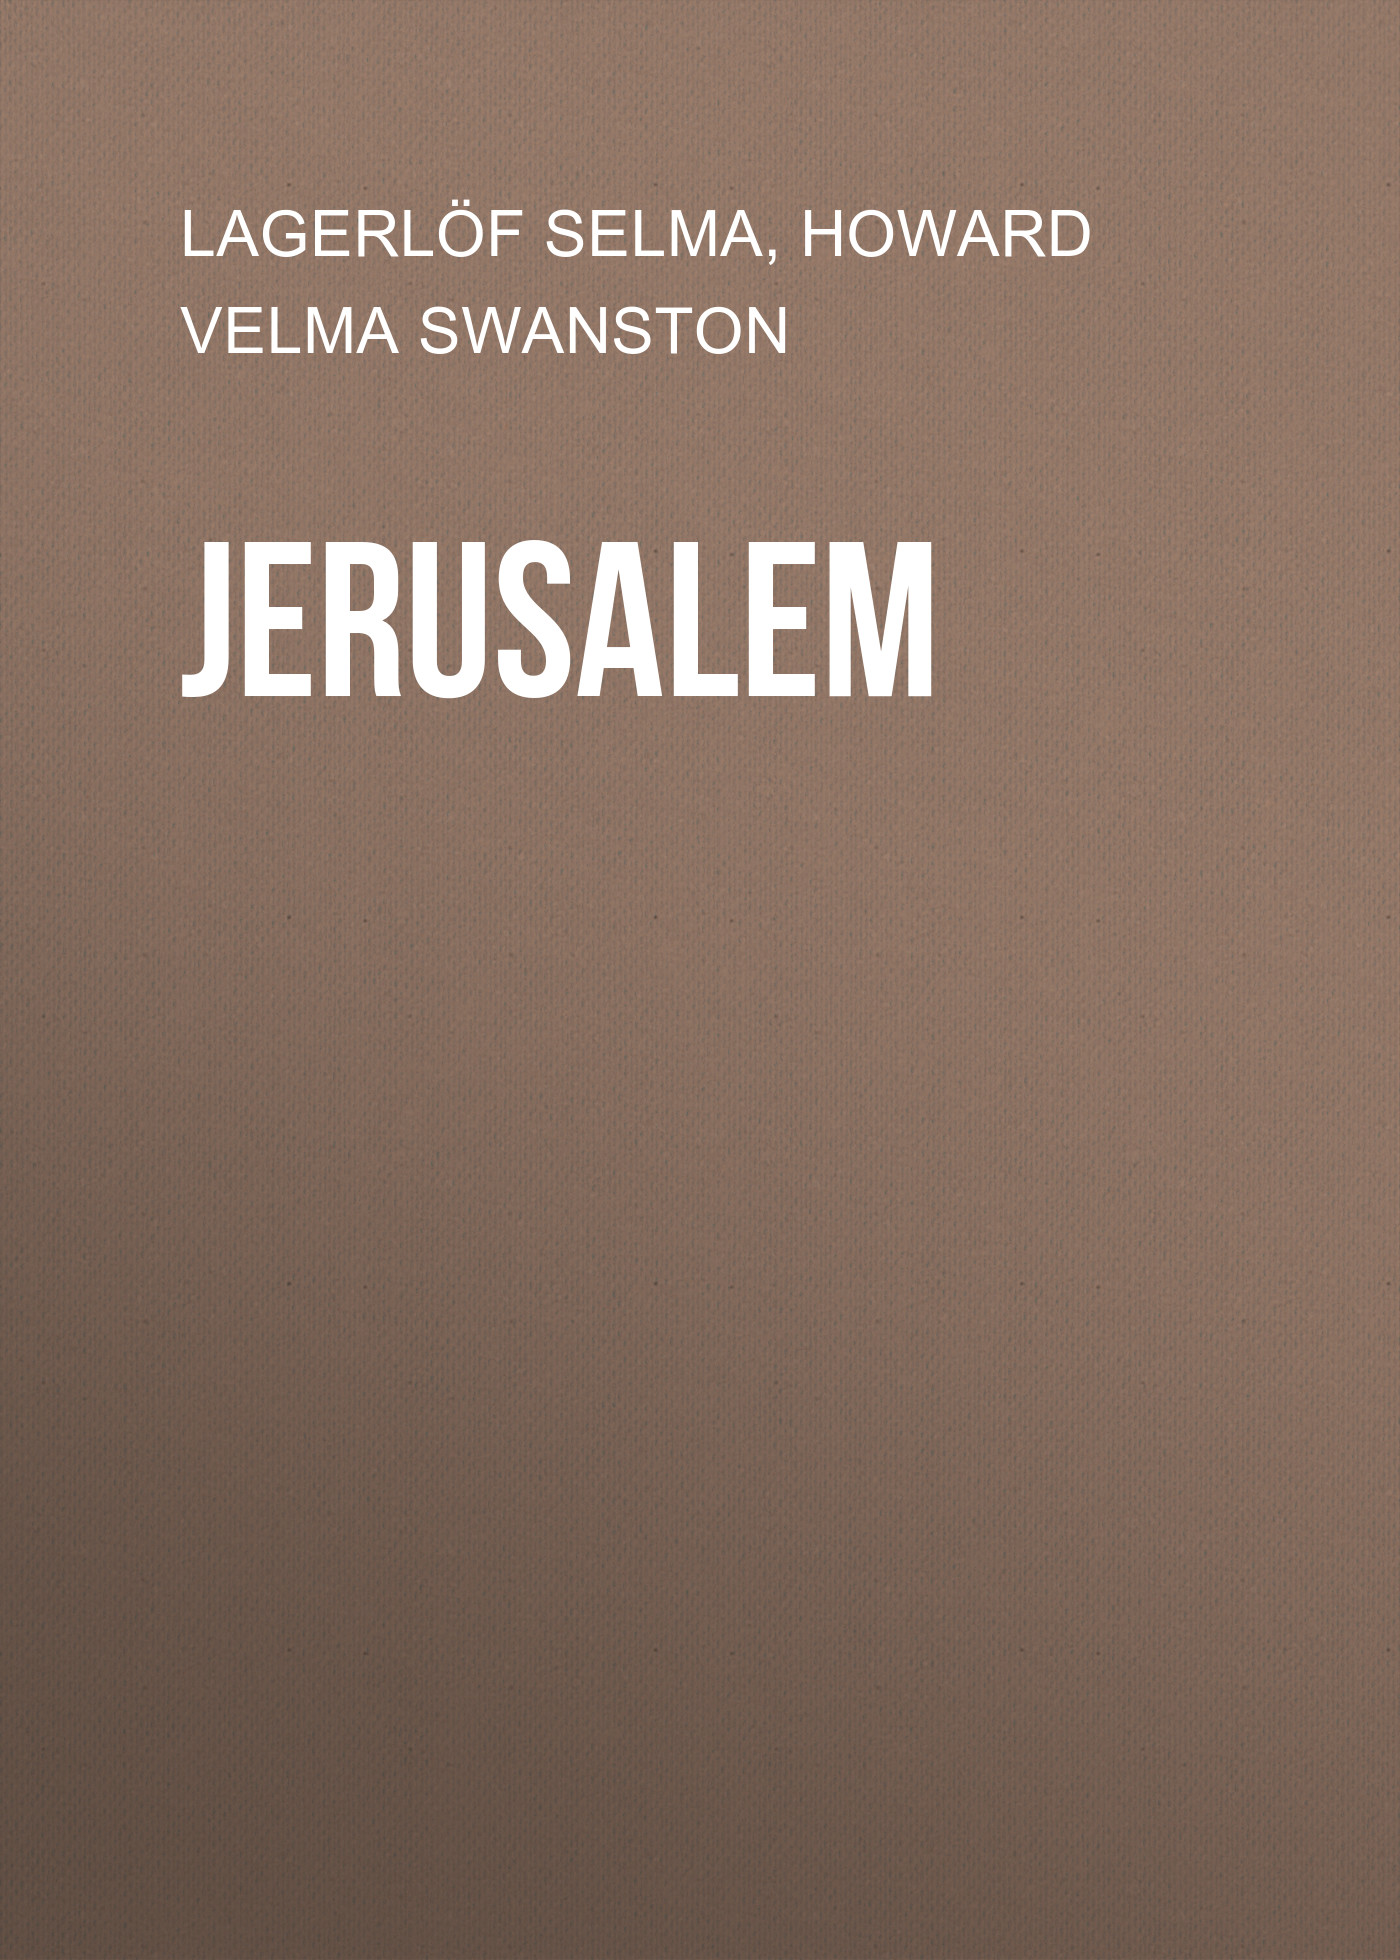 все цены на Lagerlöf Selma Jerusalem онлайн